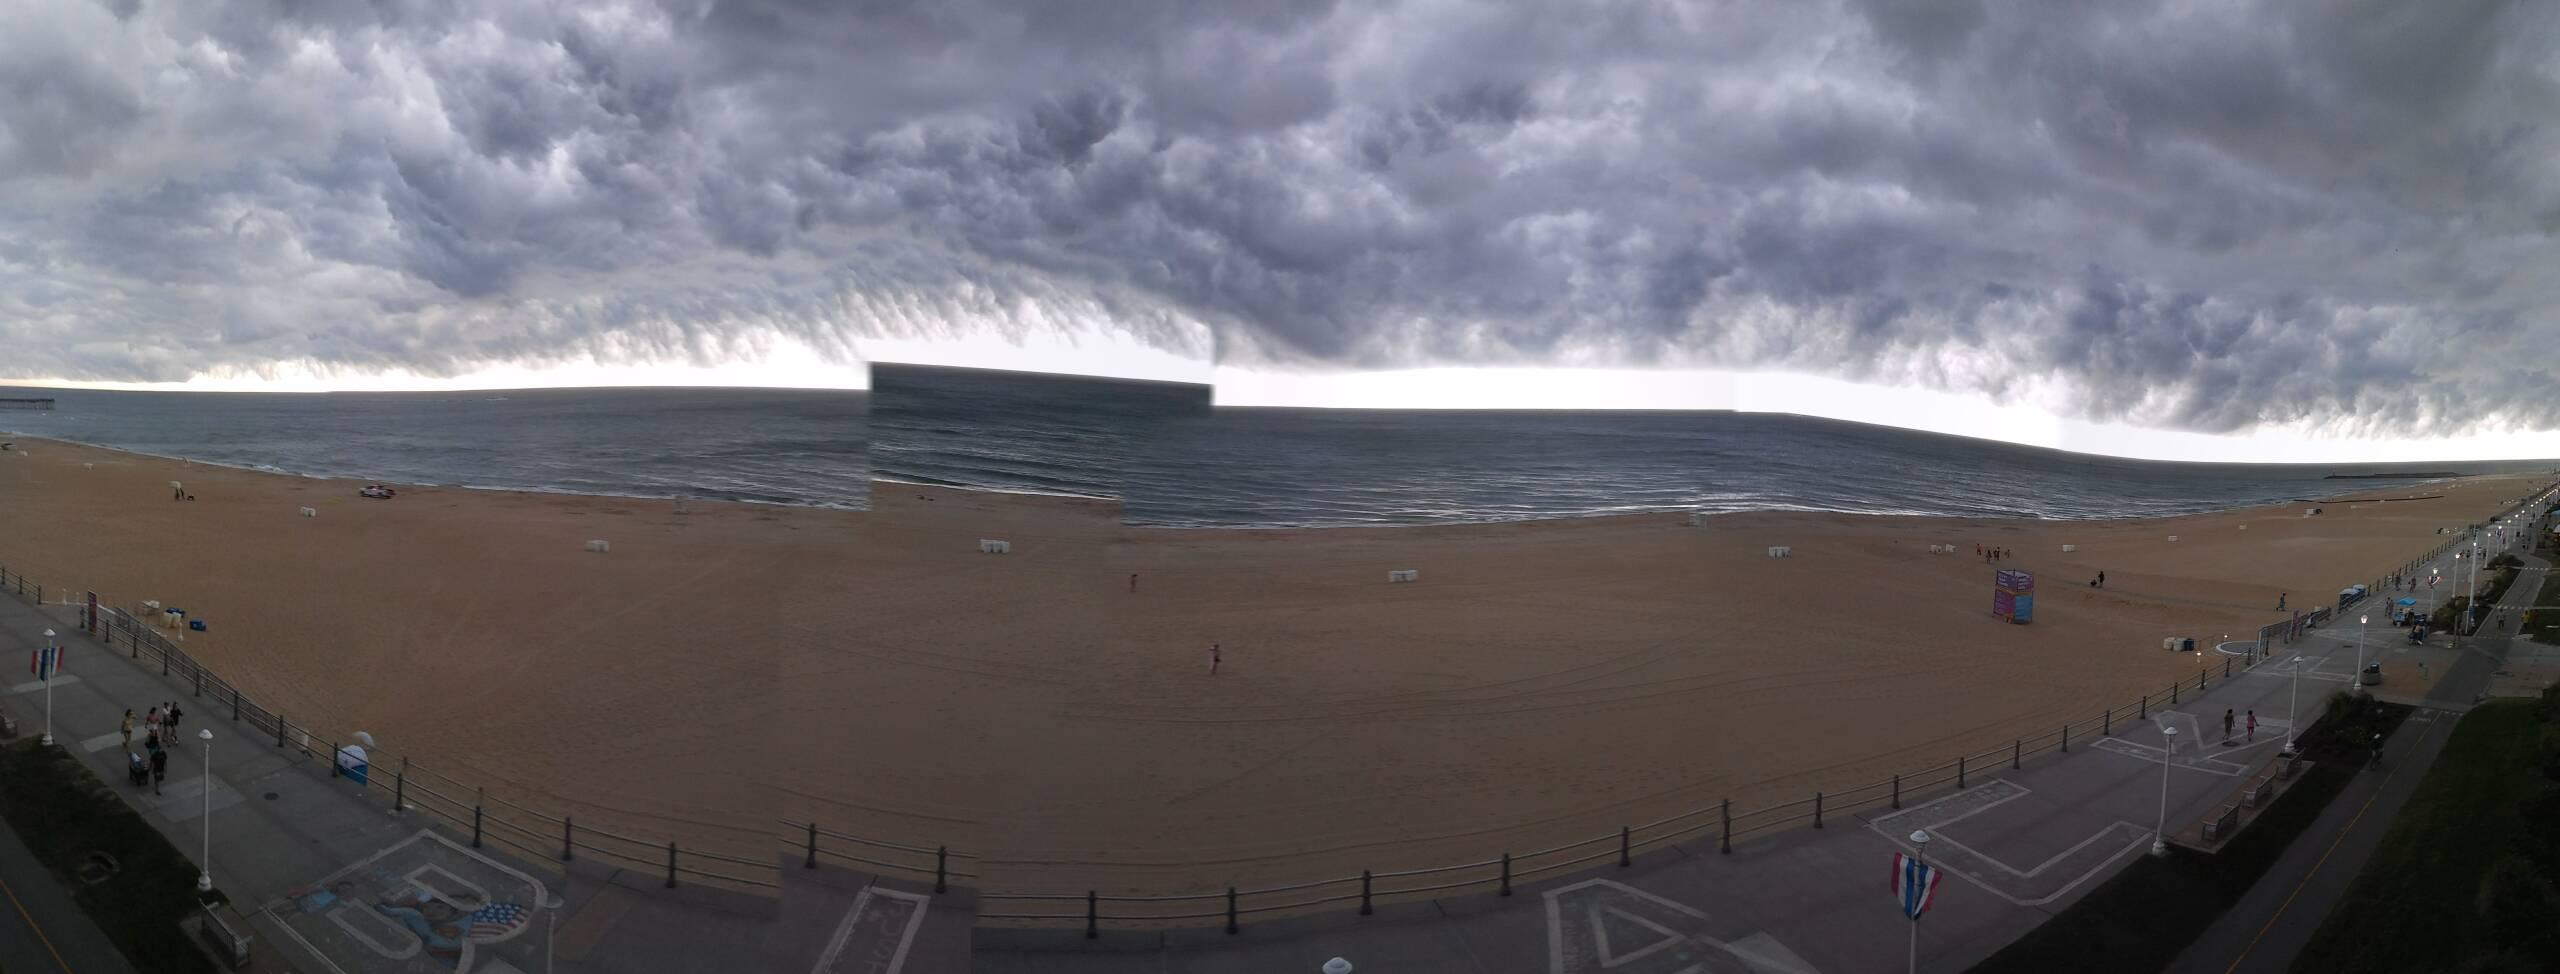 Virginia Beach Oceanfront (Ralph Copley) 4.jpg